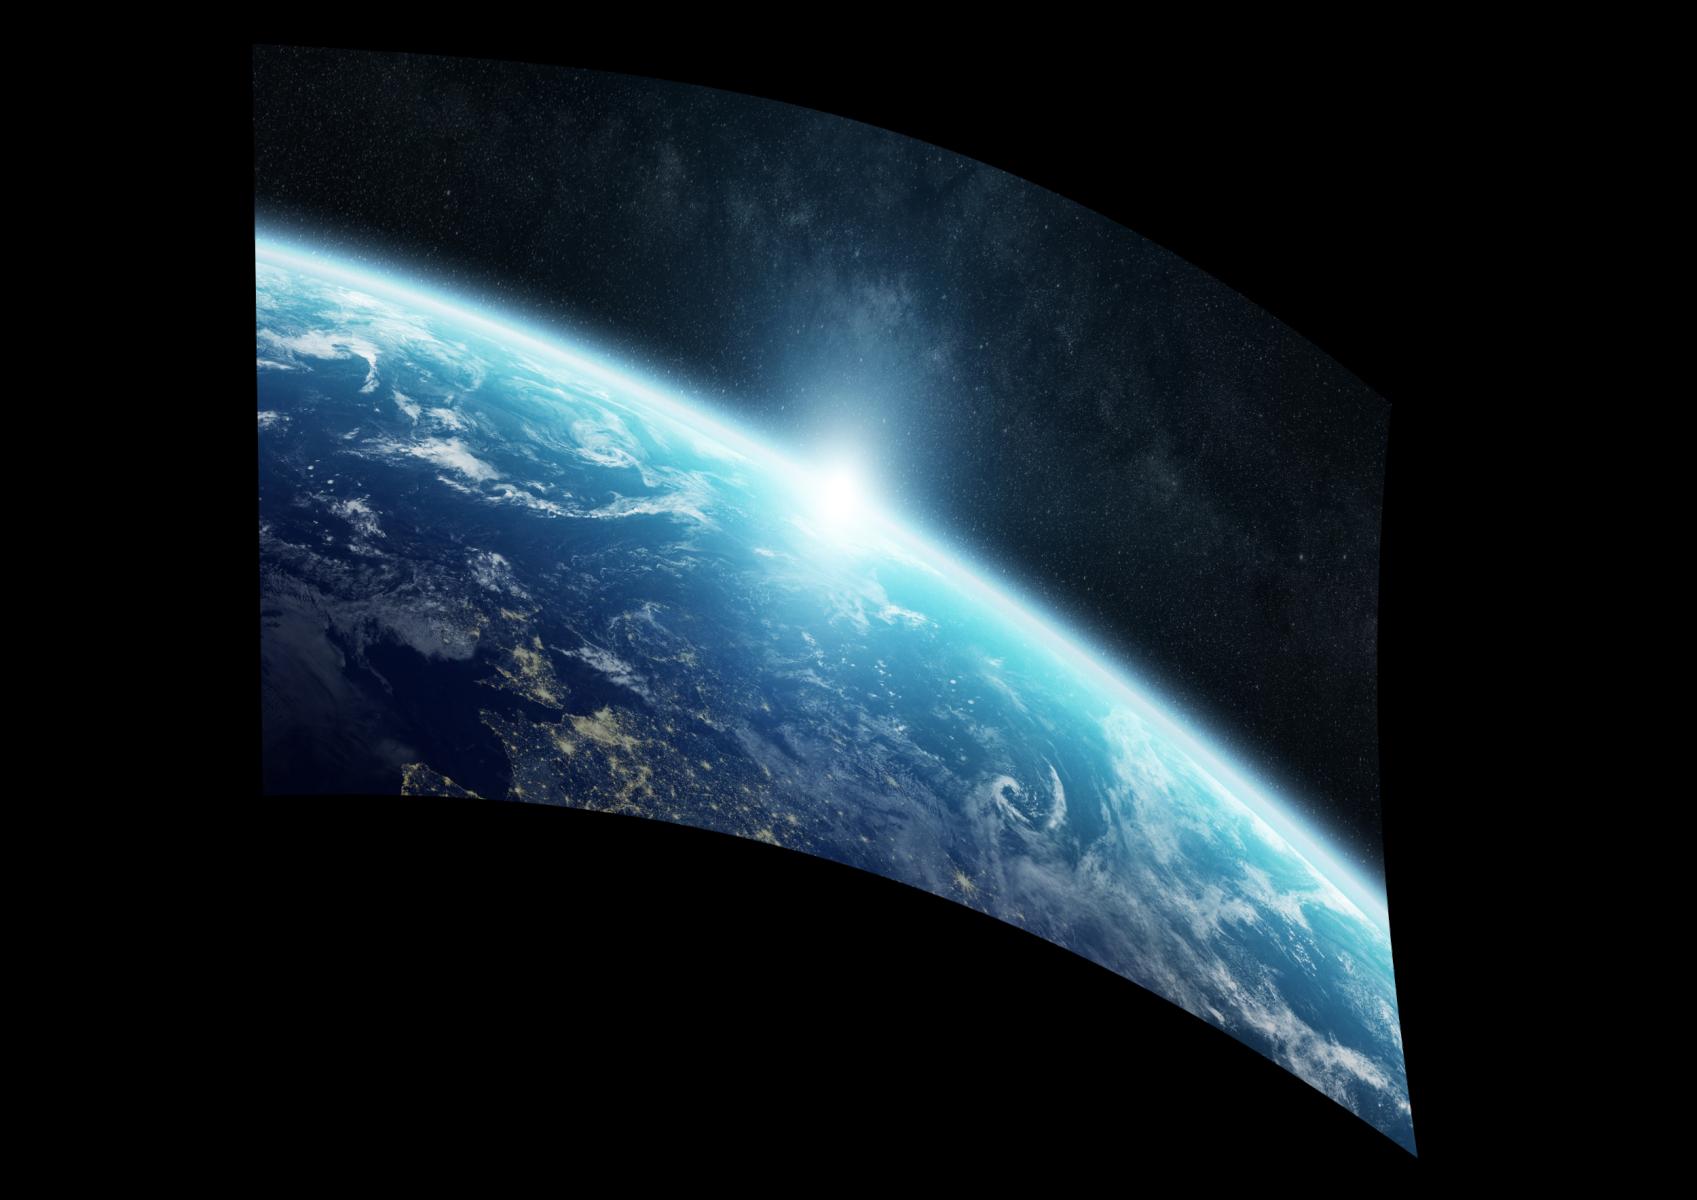 050101s - 36x54 Standard Earth 1